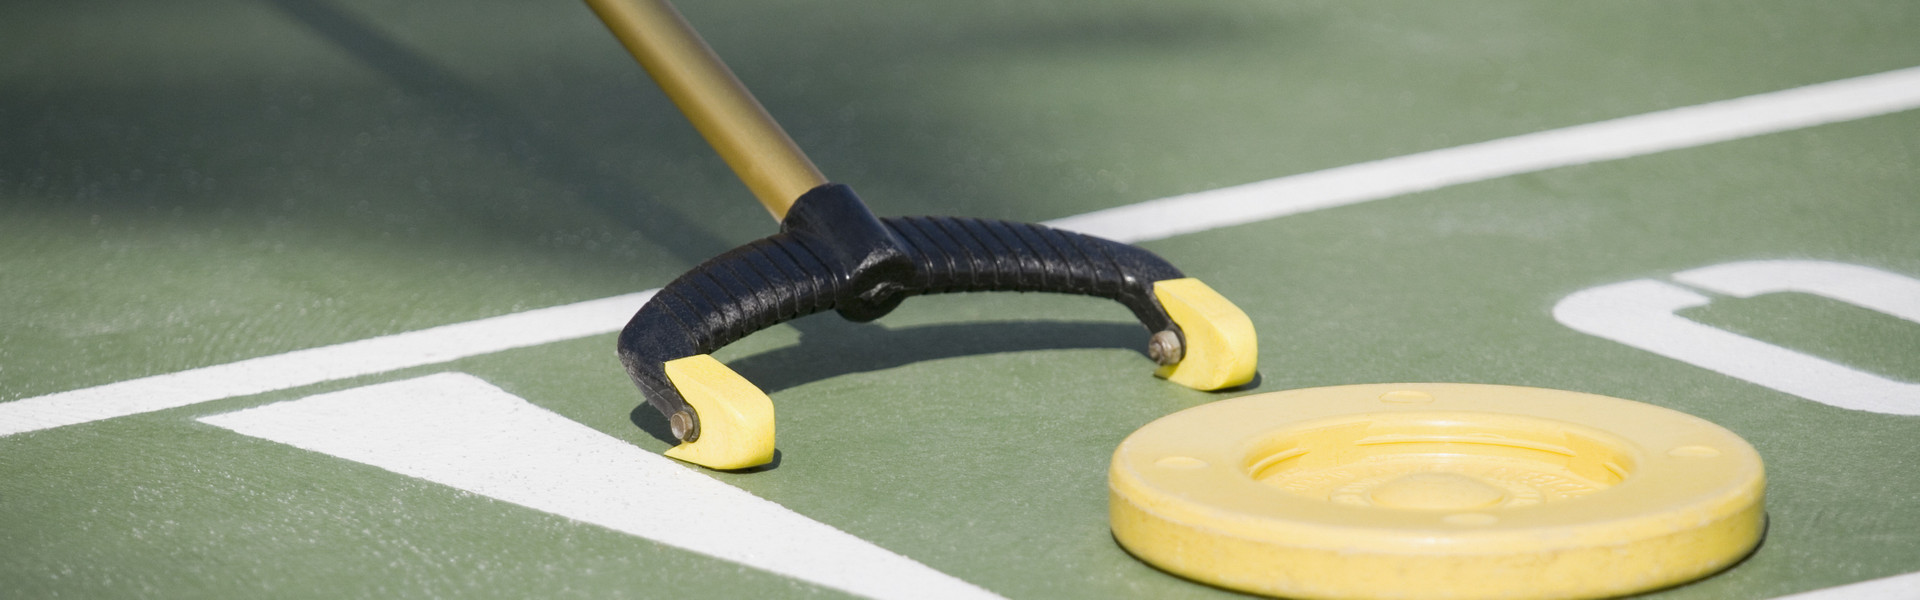 Playing shuffleboard at our resort in Orlando, FL | Westgate Lakes Resort & Spa